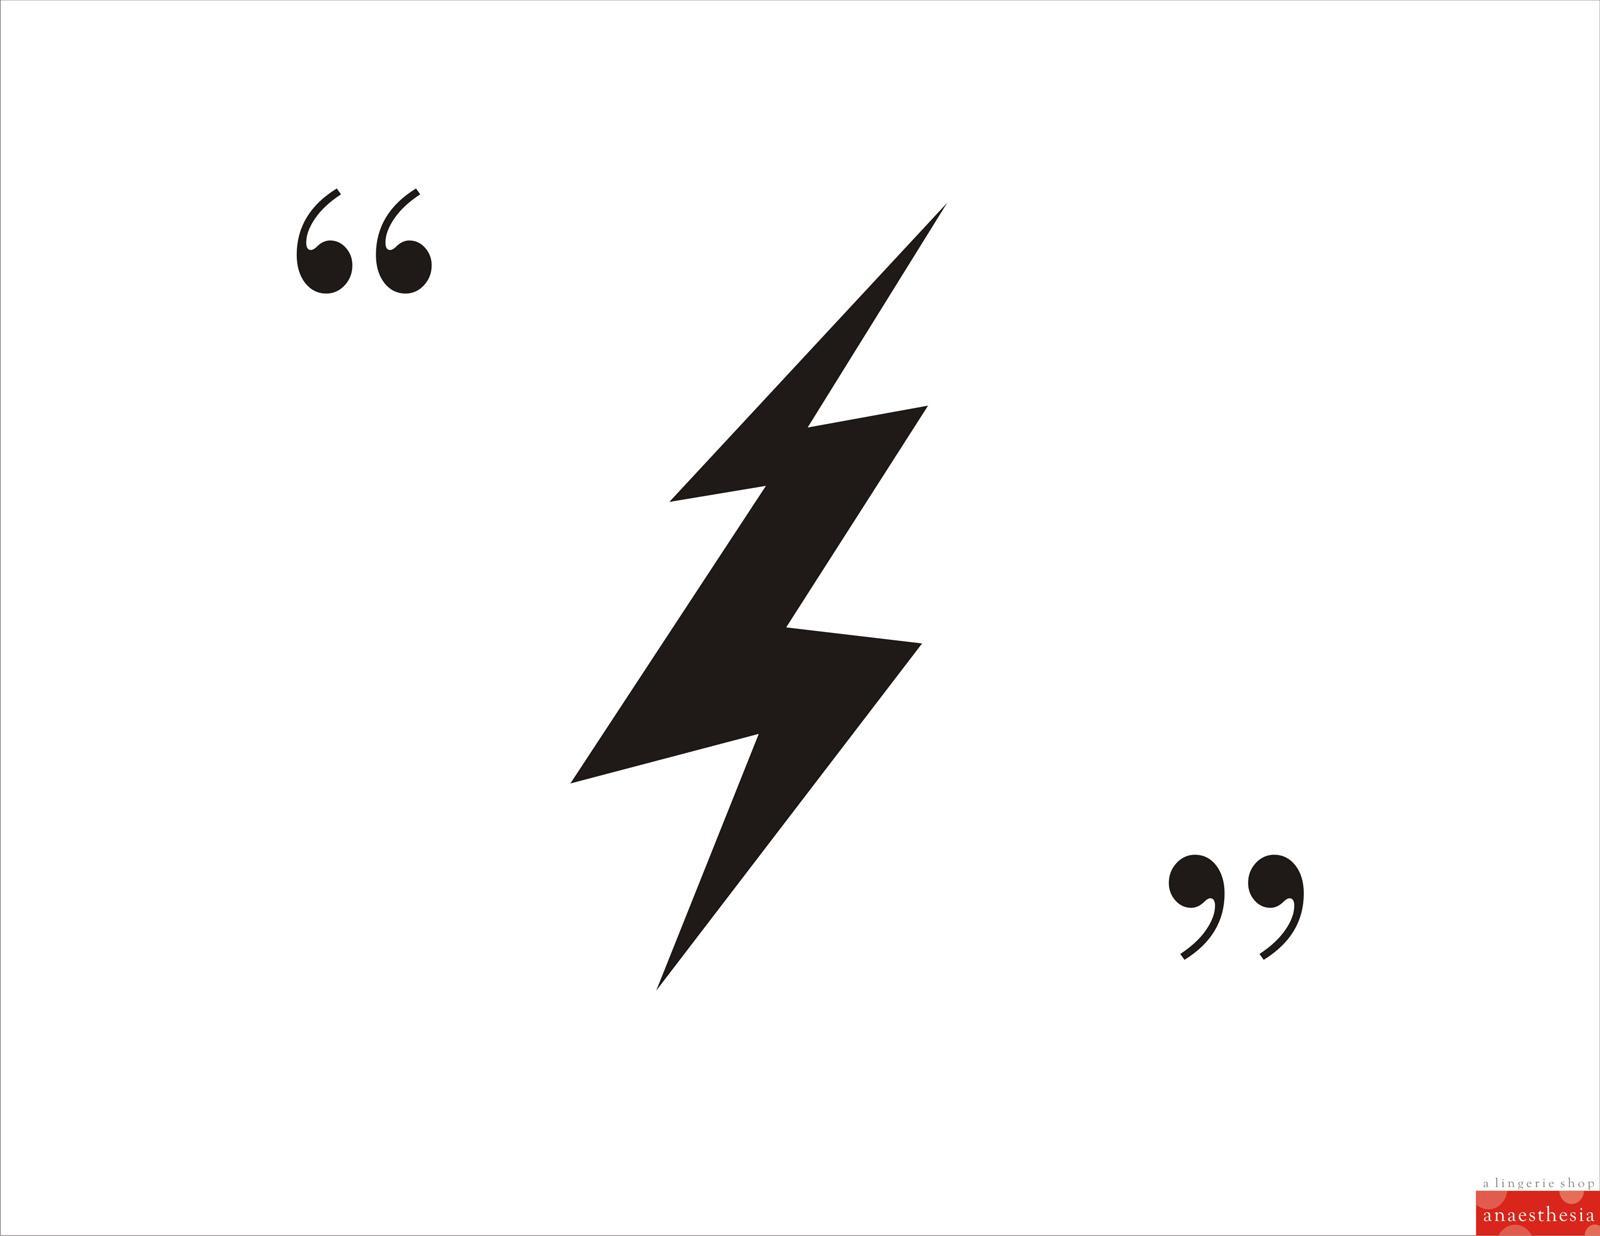 Anaesthesia Lingerie Print Ad -  Lightning